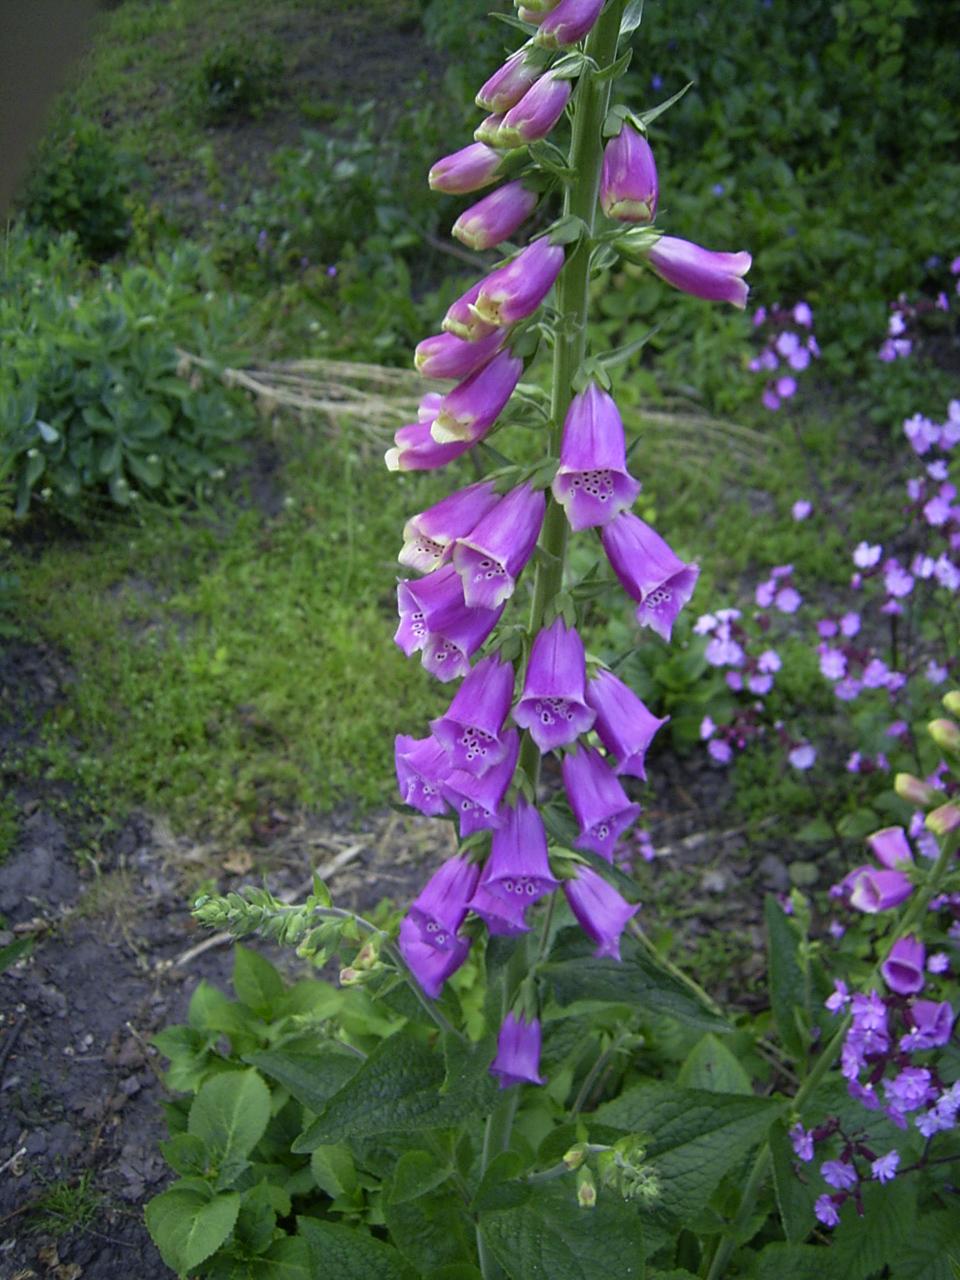 Garden Bush: Vingerhoedskruid (geslacht)